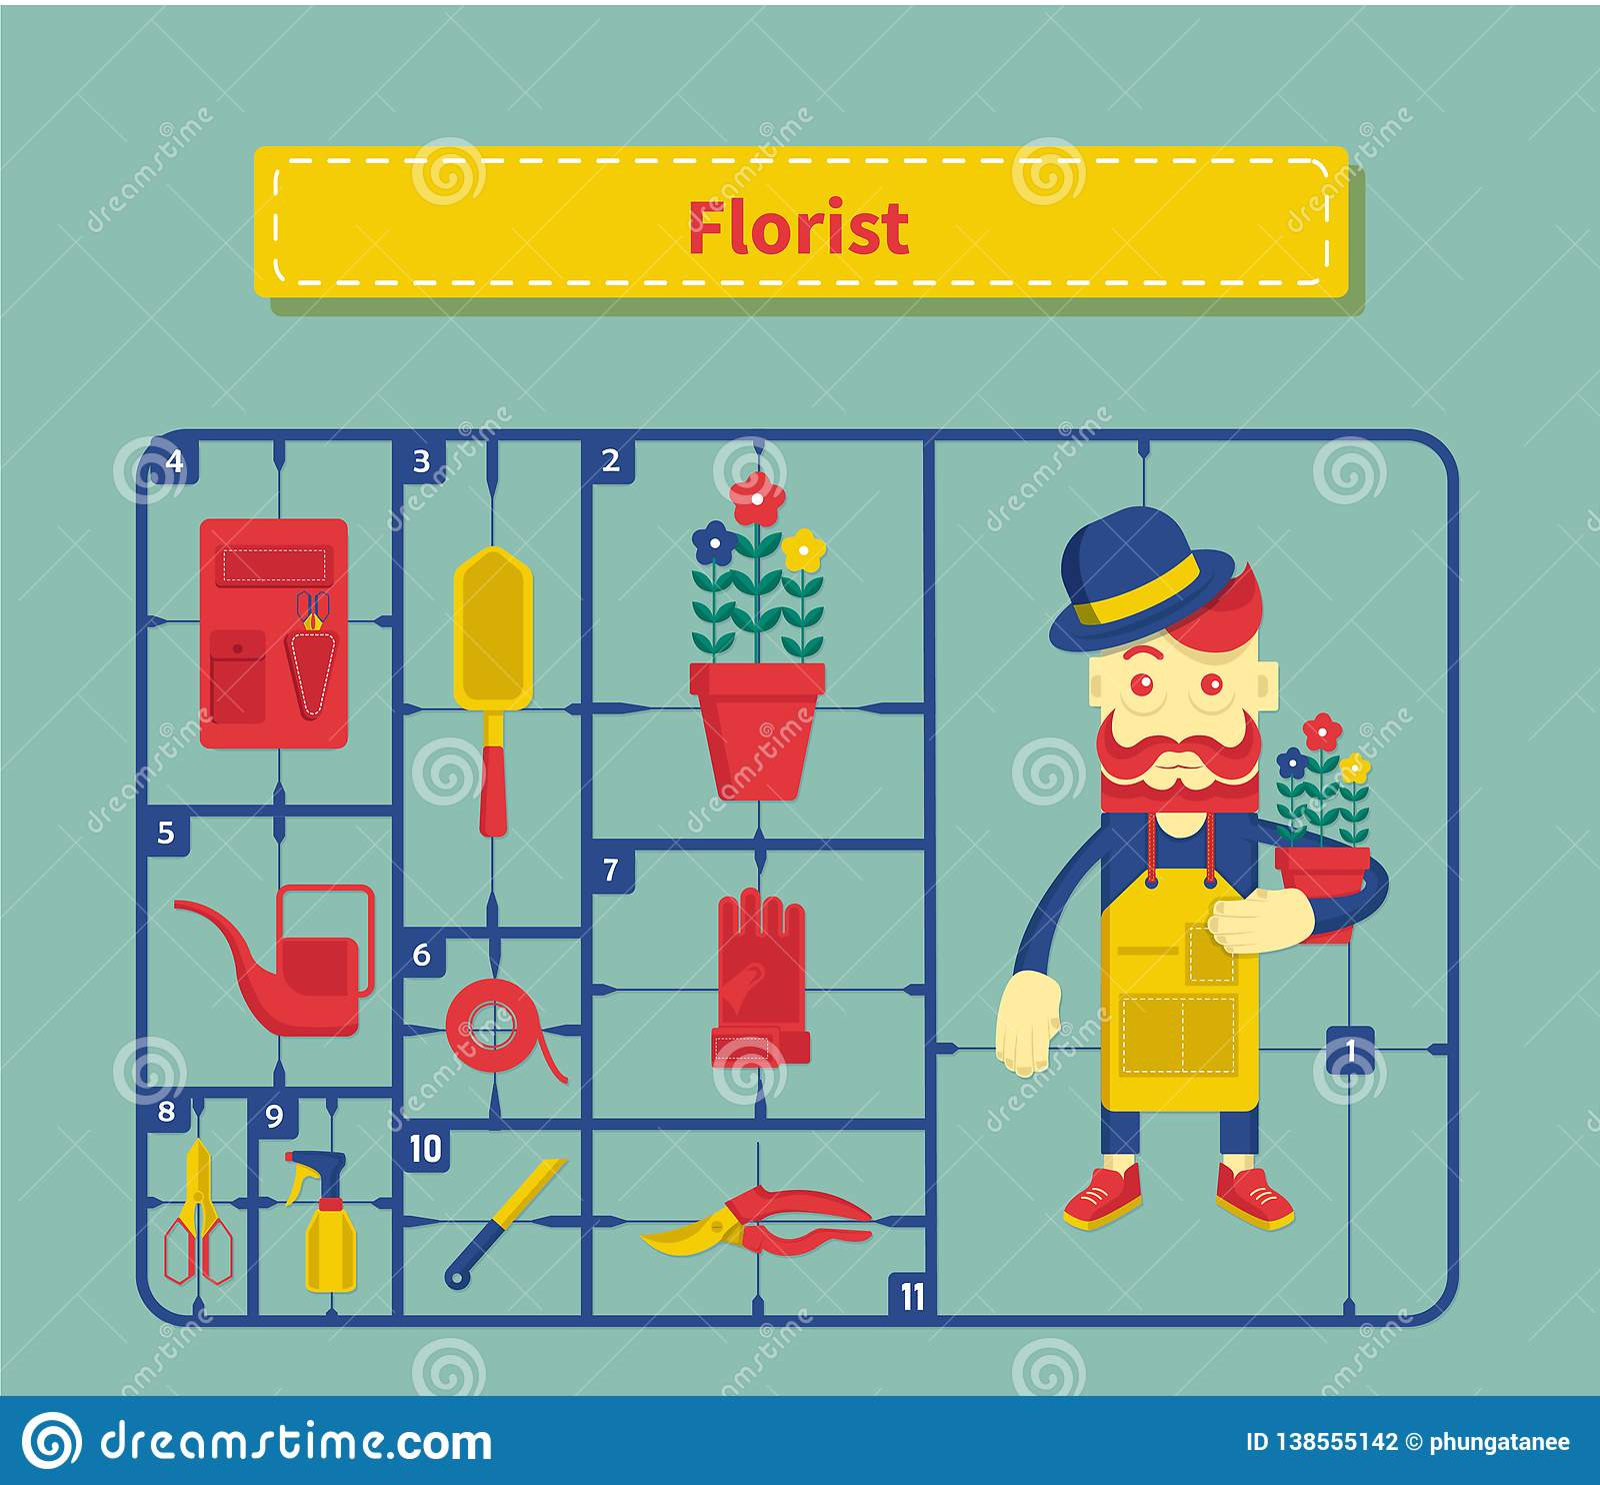 Desenhos animados do conceito do estilo do vintage do florista do caráter